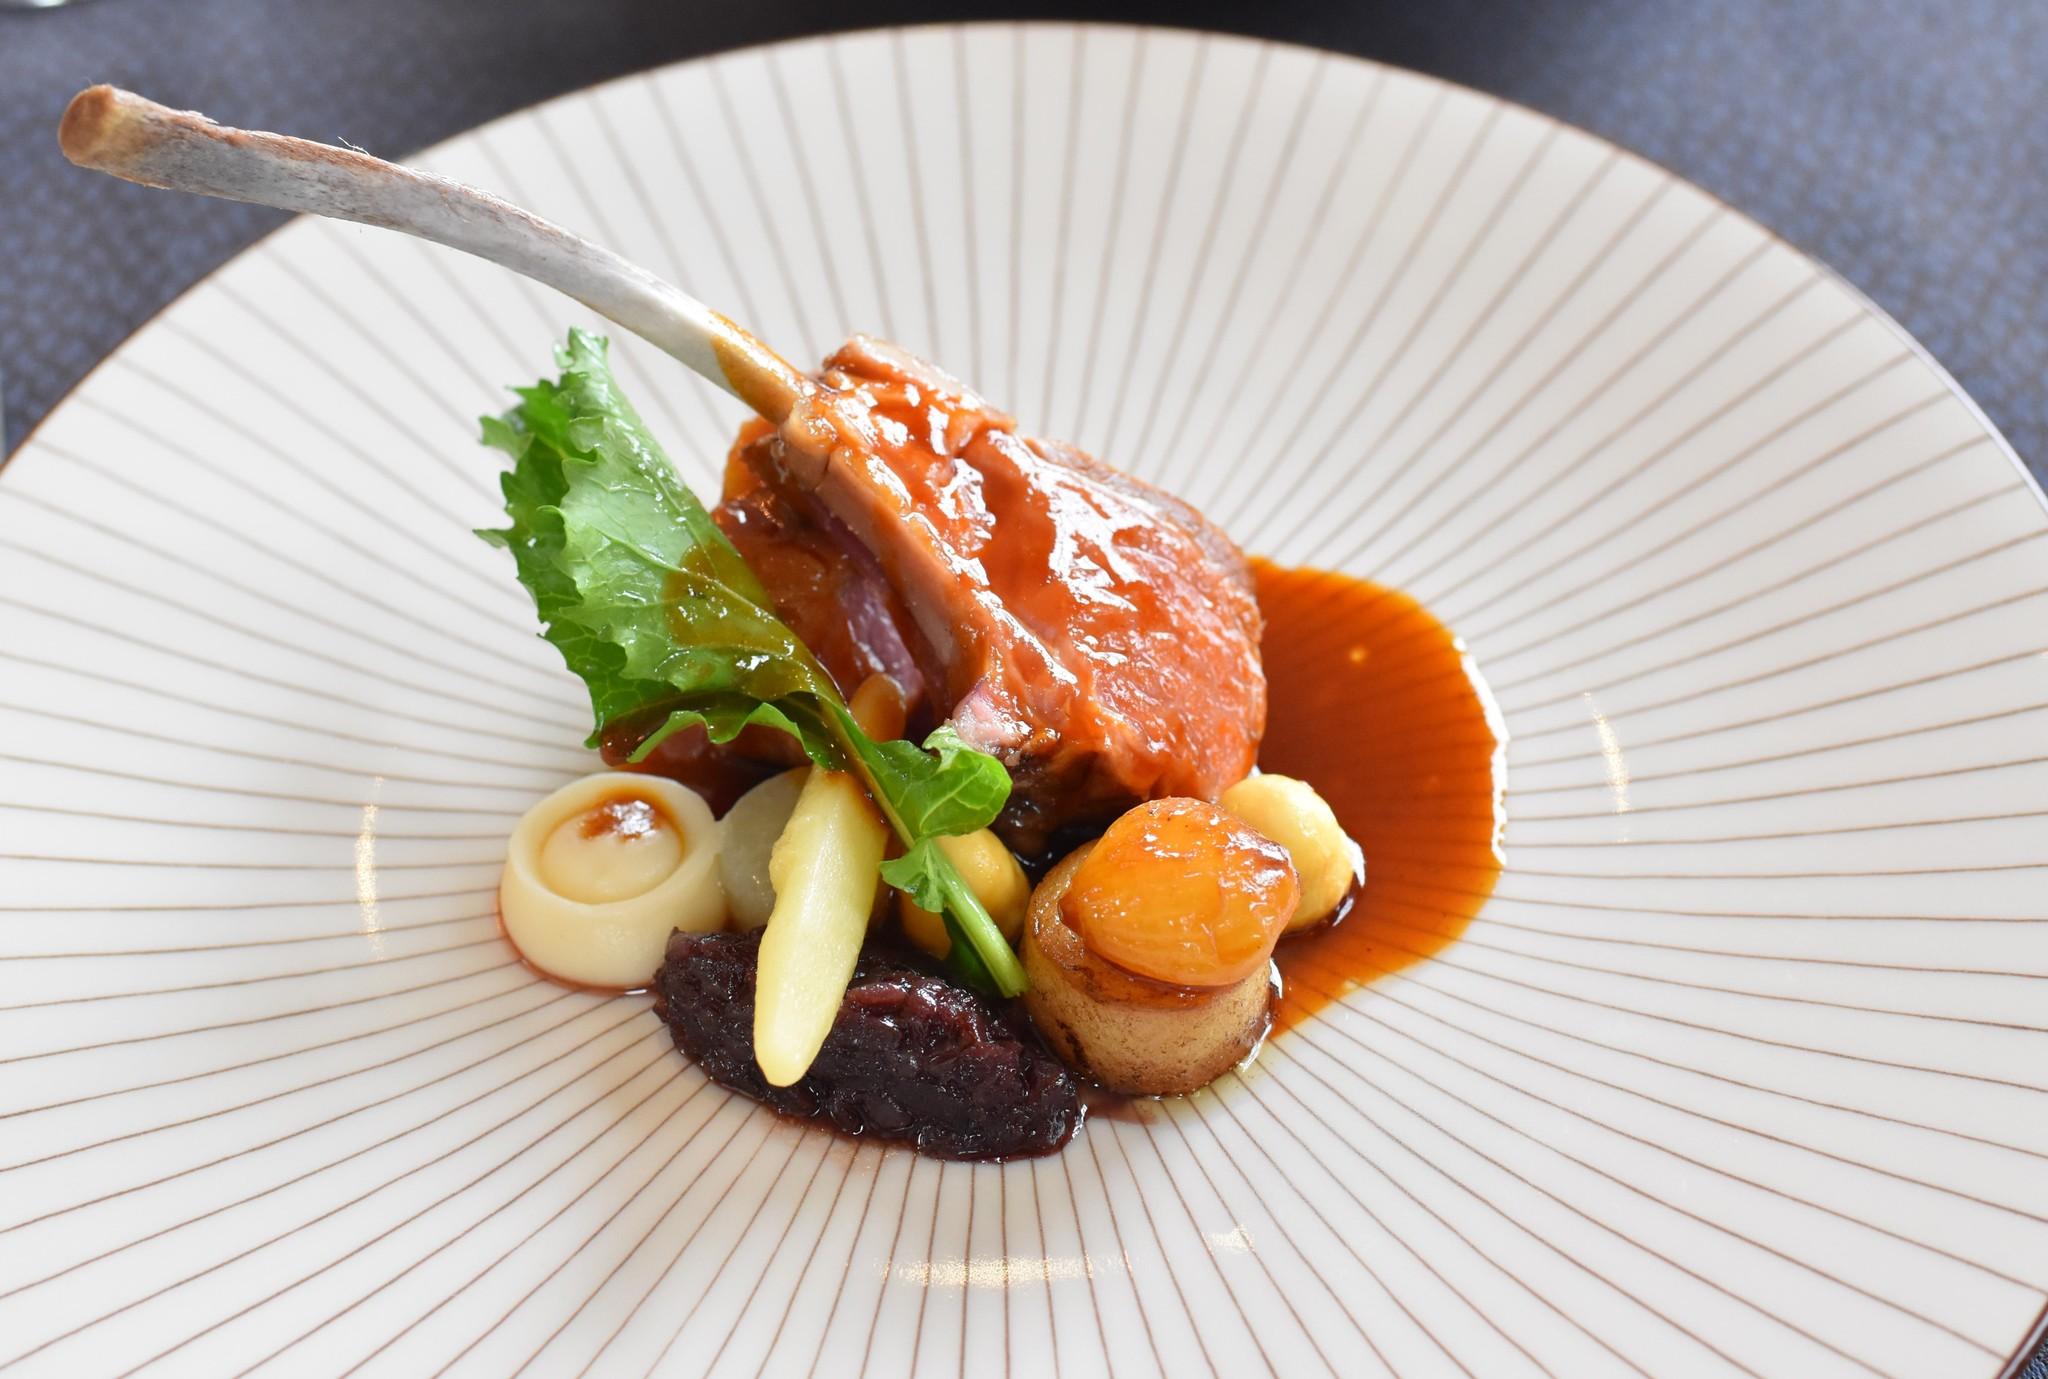 Restaurant Mijn Keuken : Restaurant mijn keuken markt wouw mijn keuken wouw be gusto